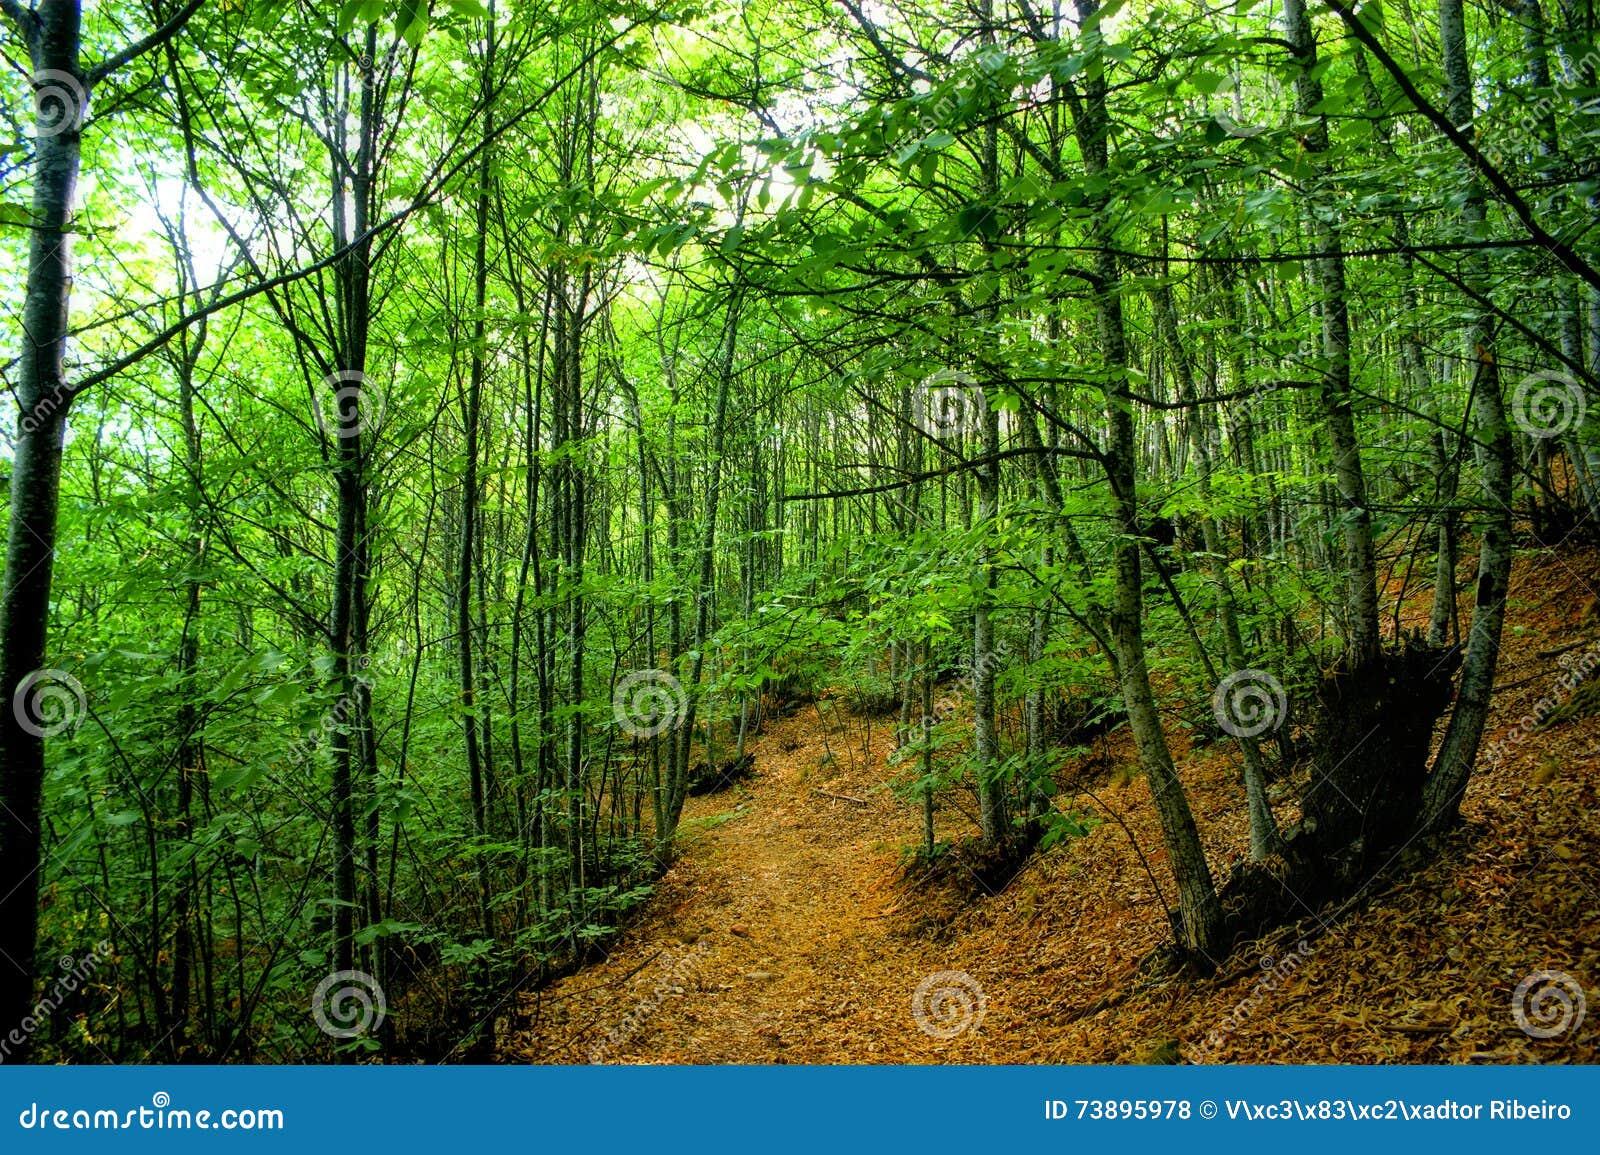 Grove of chestnut trees in Las Medulas